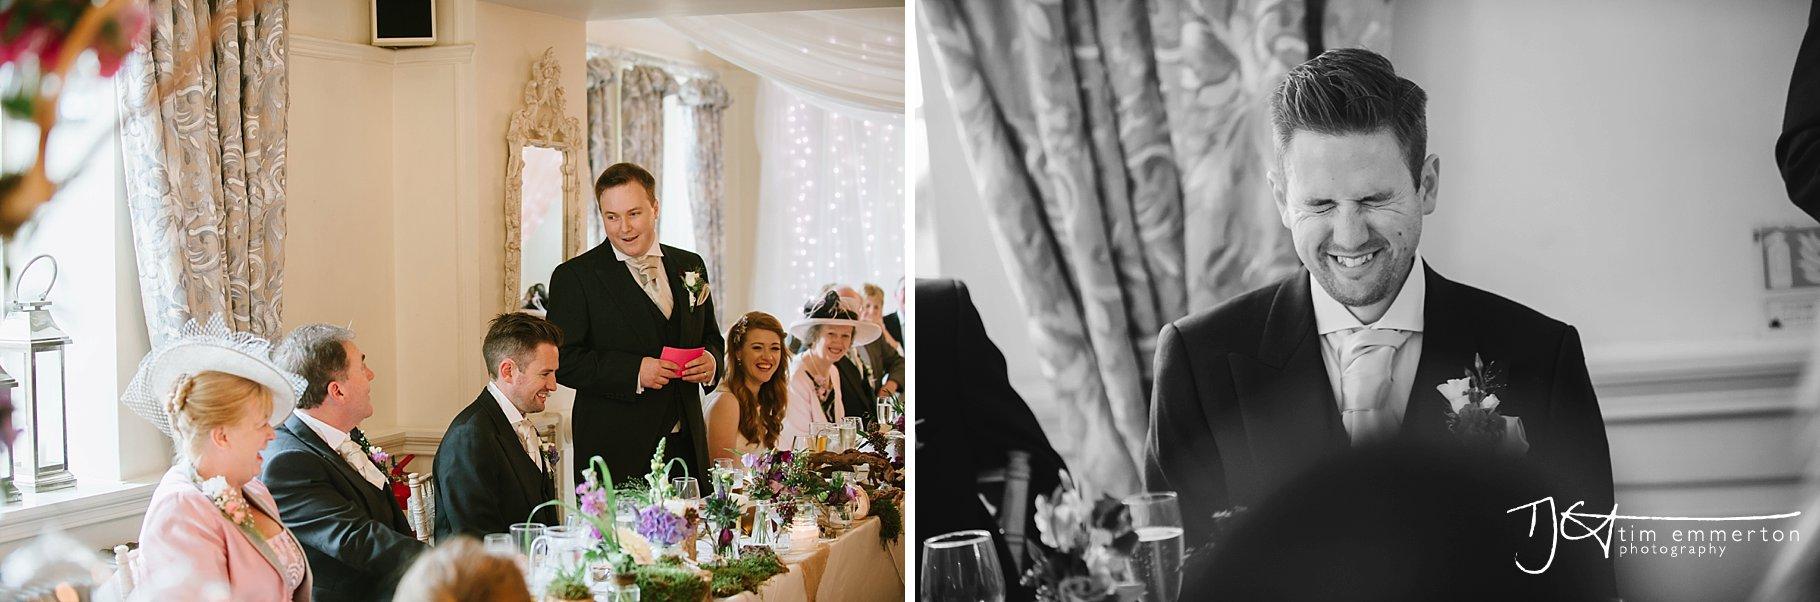 Eaves-Hall-Wedding-Photographer-108.jpg